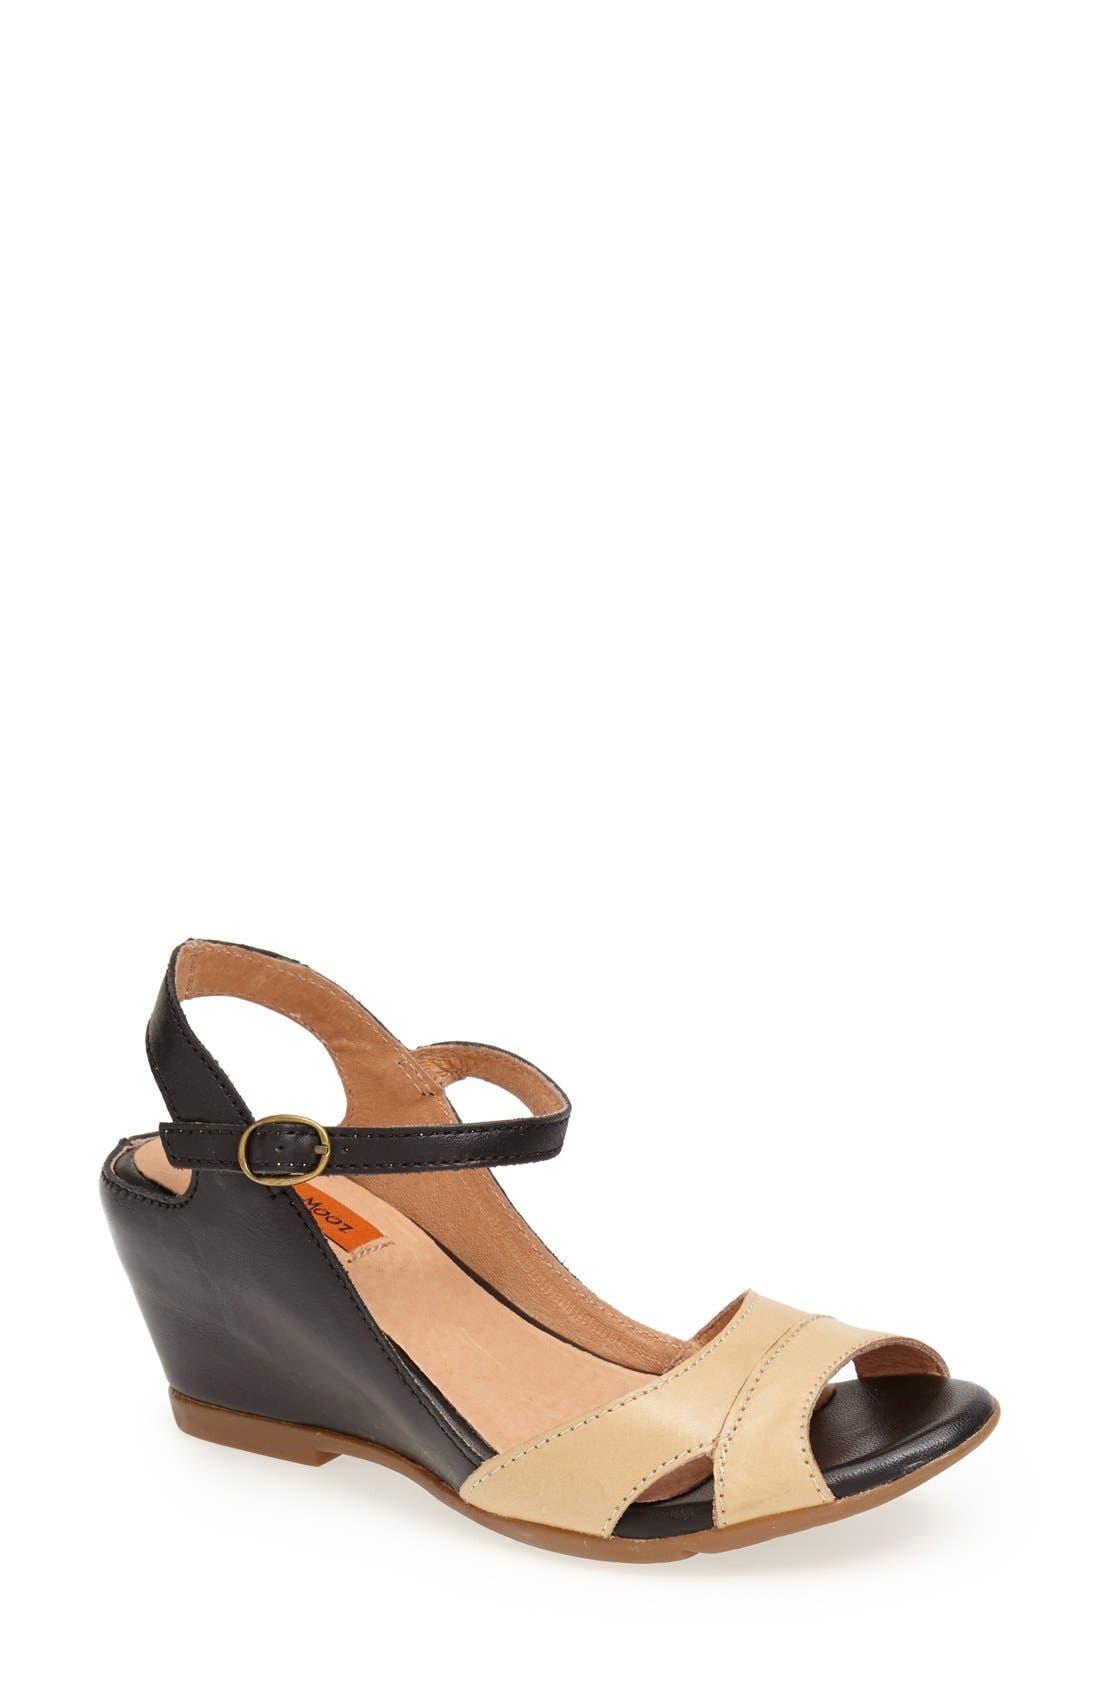 Alternate Image 1 Selected - Miz Mooz Footwear 'Cosette' Wedge Sandal (Women)